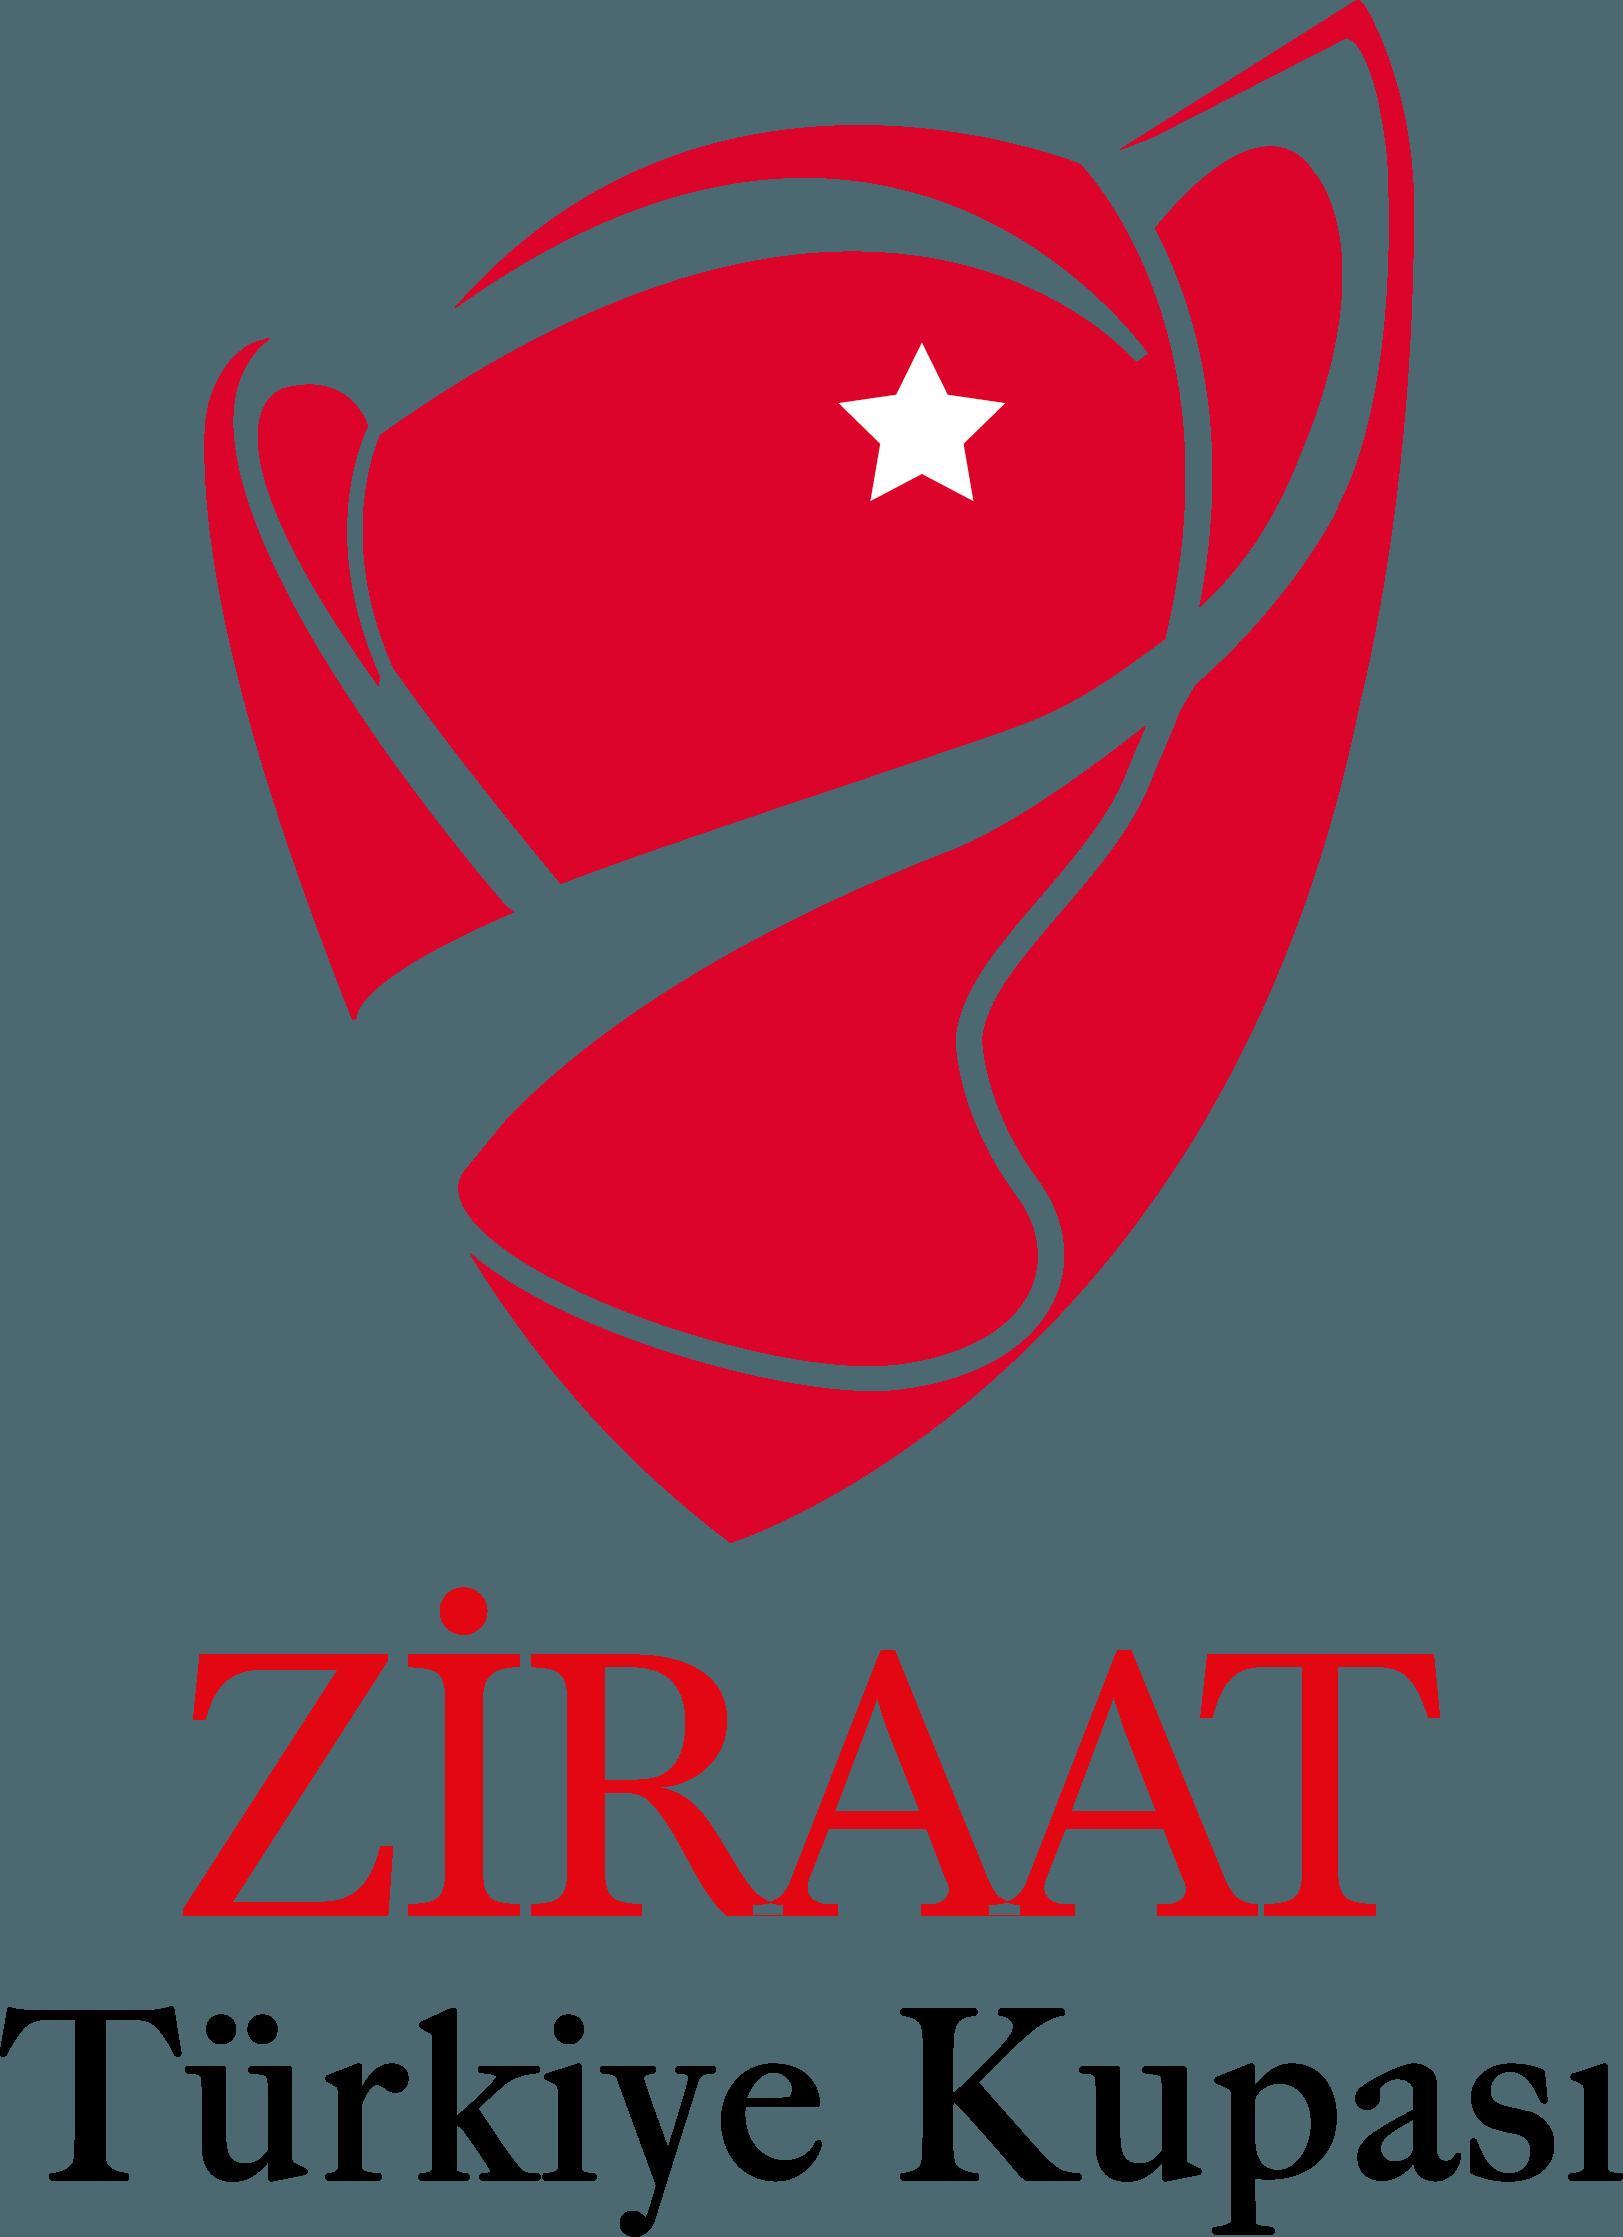 ziraat-turkiye-kupasi-logo